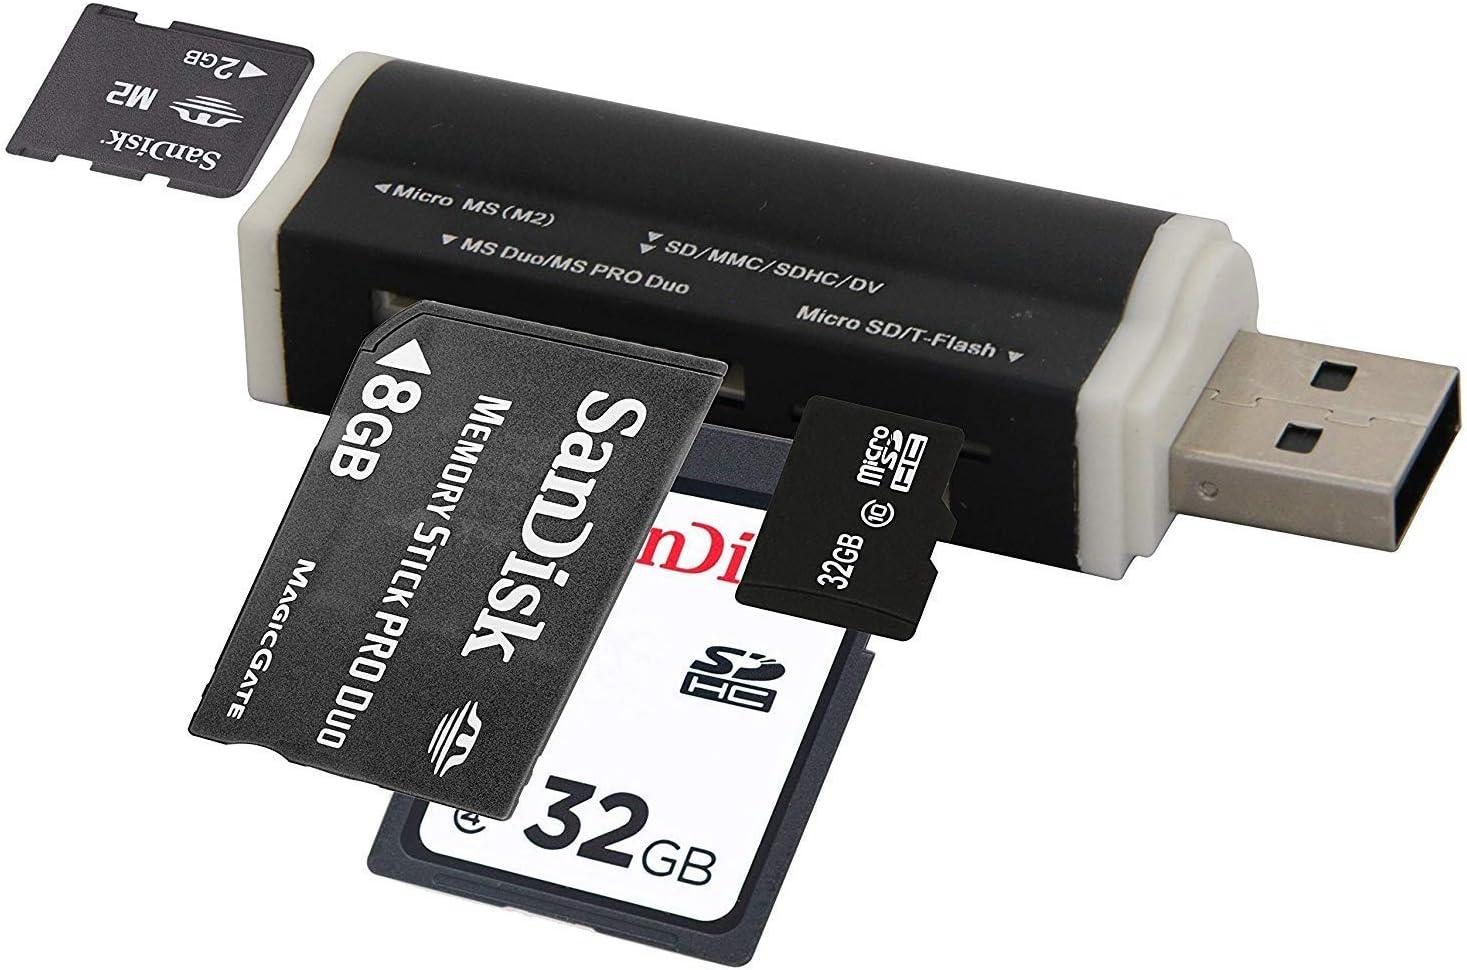 Cofi1453 Usb Card Reader Compatible With Sd Micro Sd M2 Elektronik